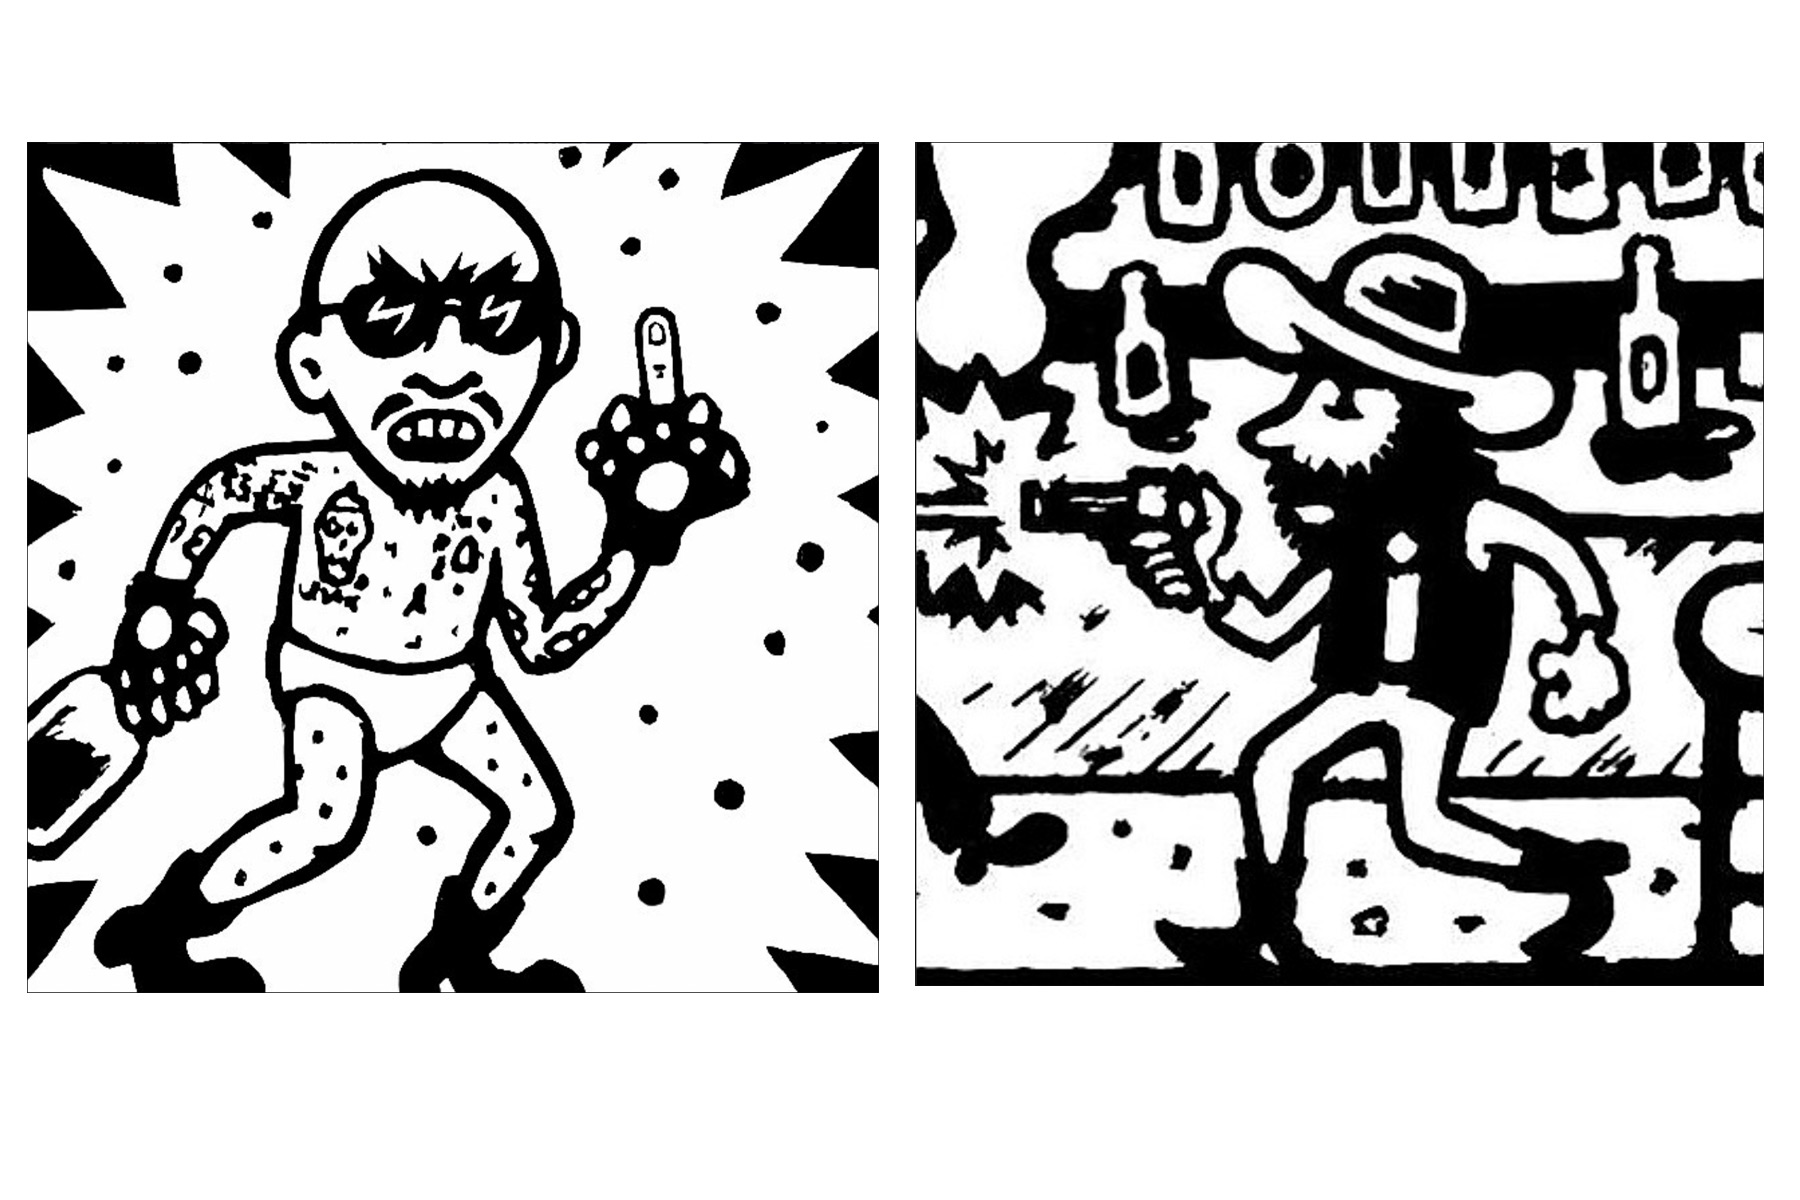 Drawings by artist Avi Spivak. Ponyboy magazine.